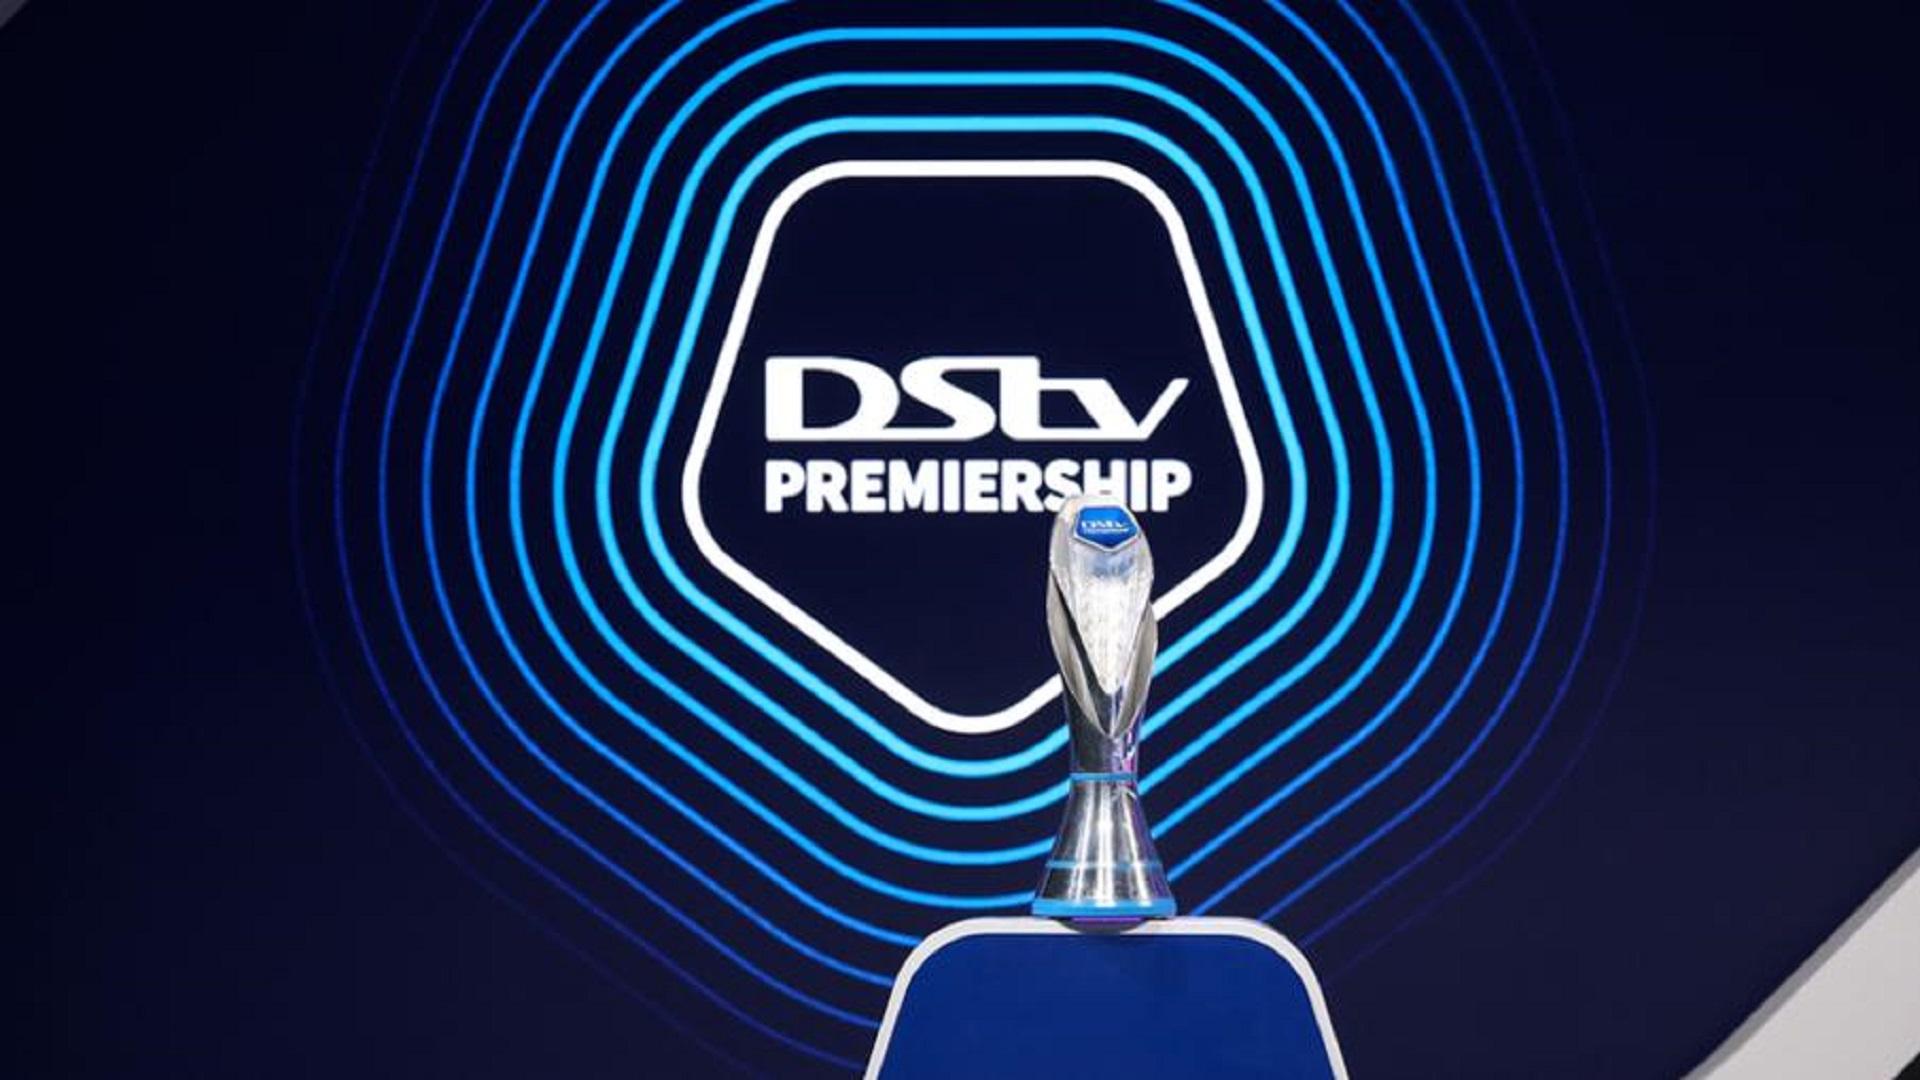 DStv Premiership | Mamelodi Sundowns v AmaZulu FC | Preview